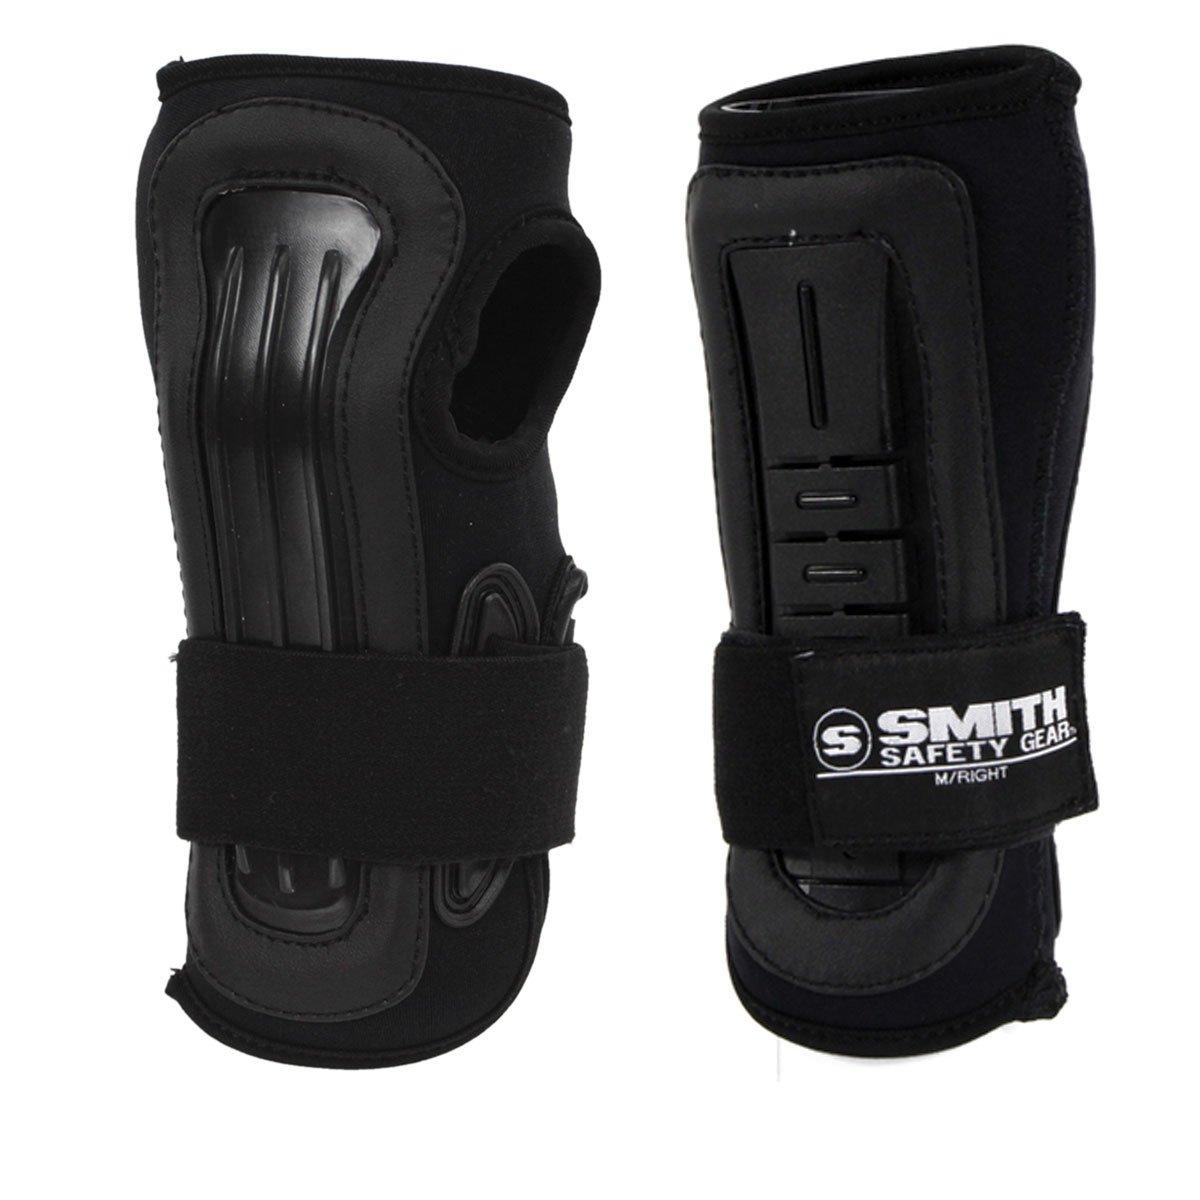 Smith Safety Gear Scabs Pro Wrist Stabilizer, Black/Black, Large